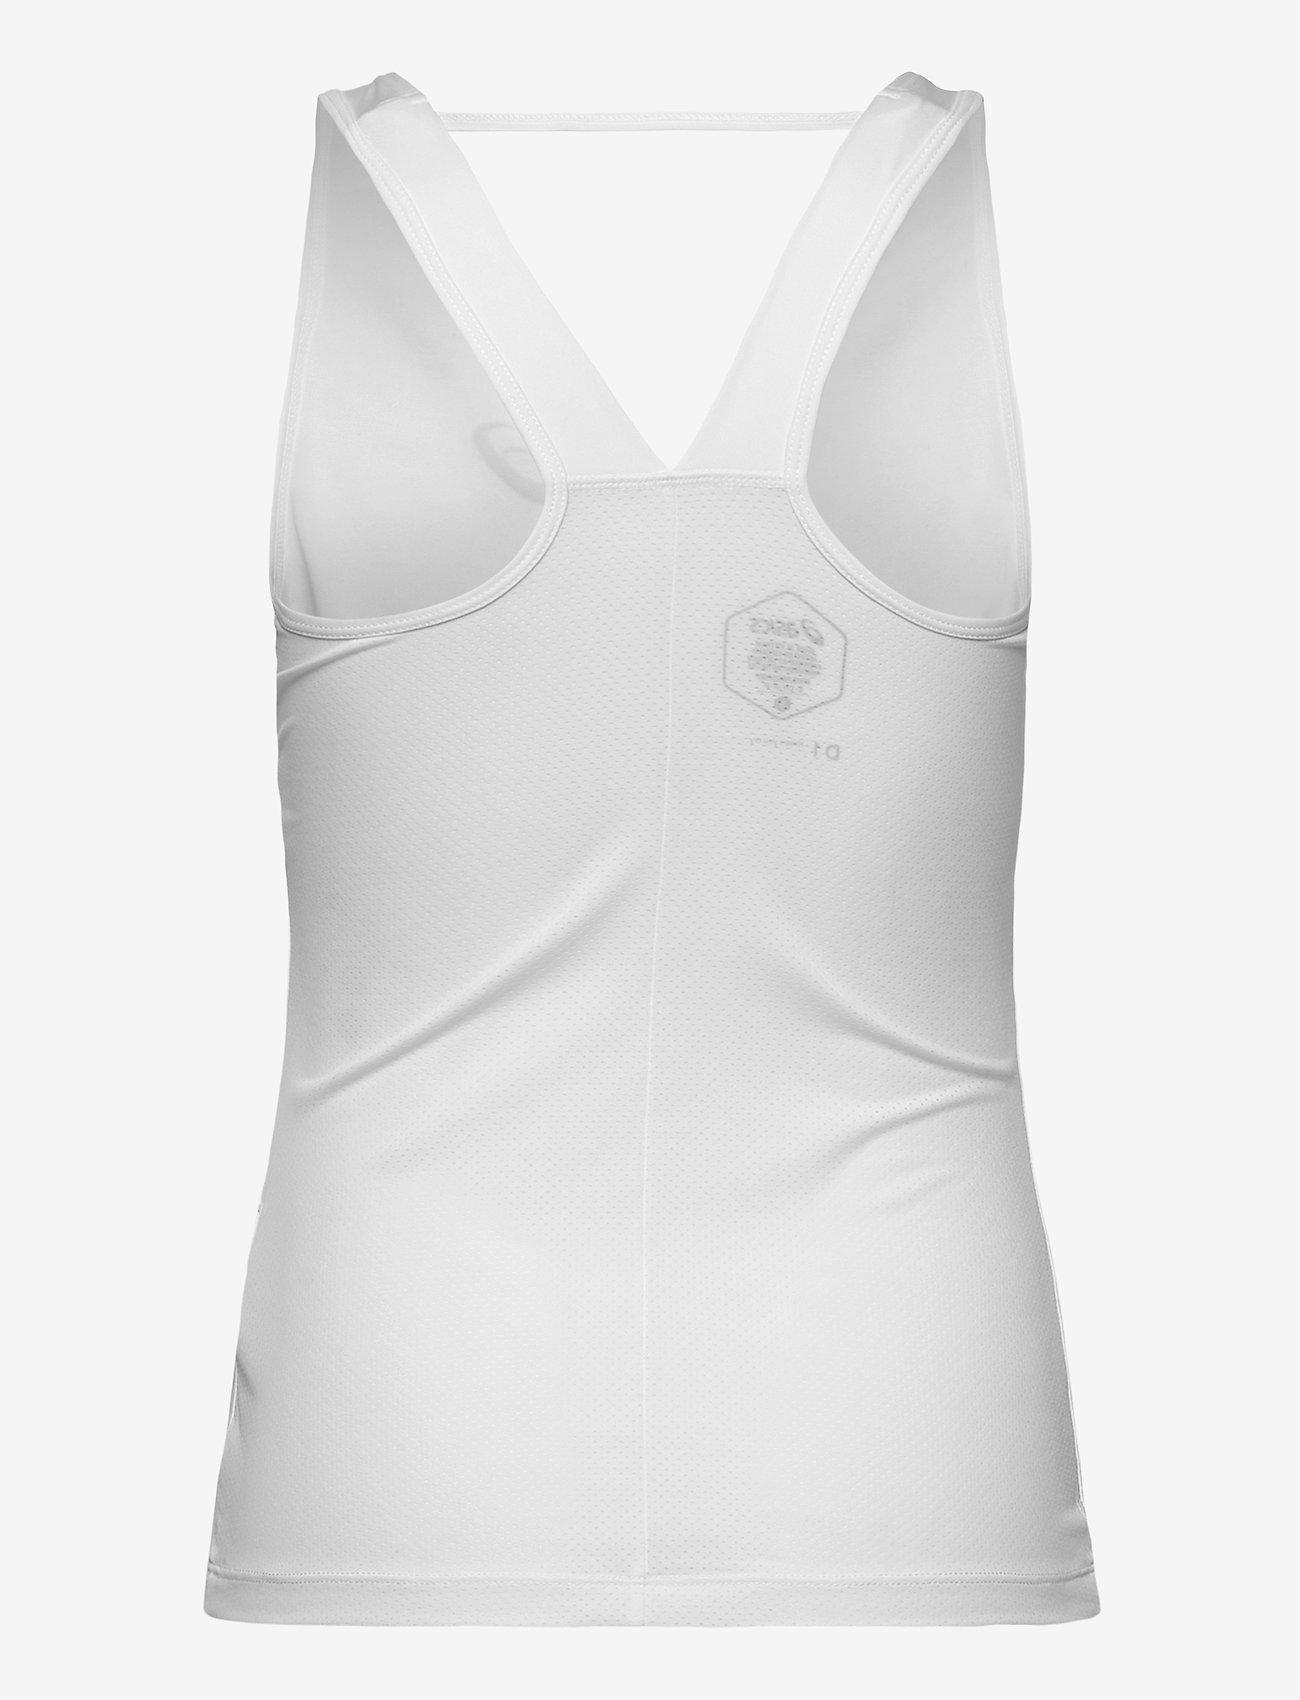 Asics - CLUB W TANK - linnen - brilliant white - 1